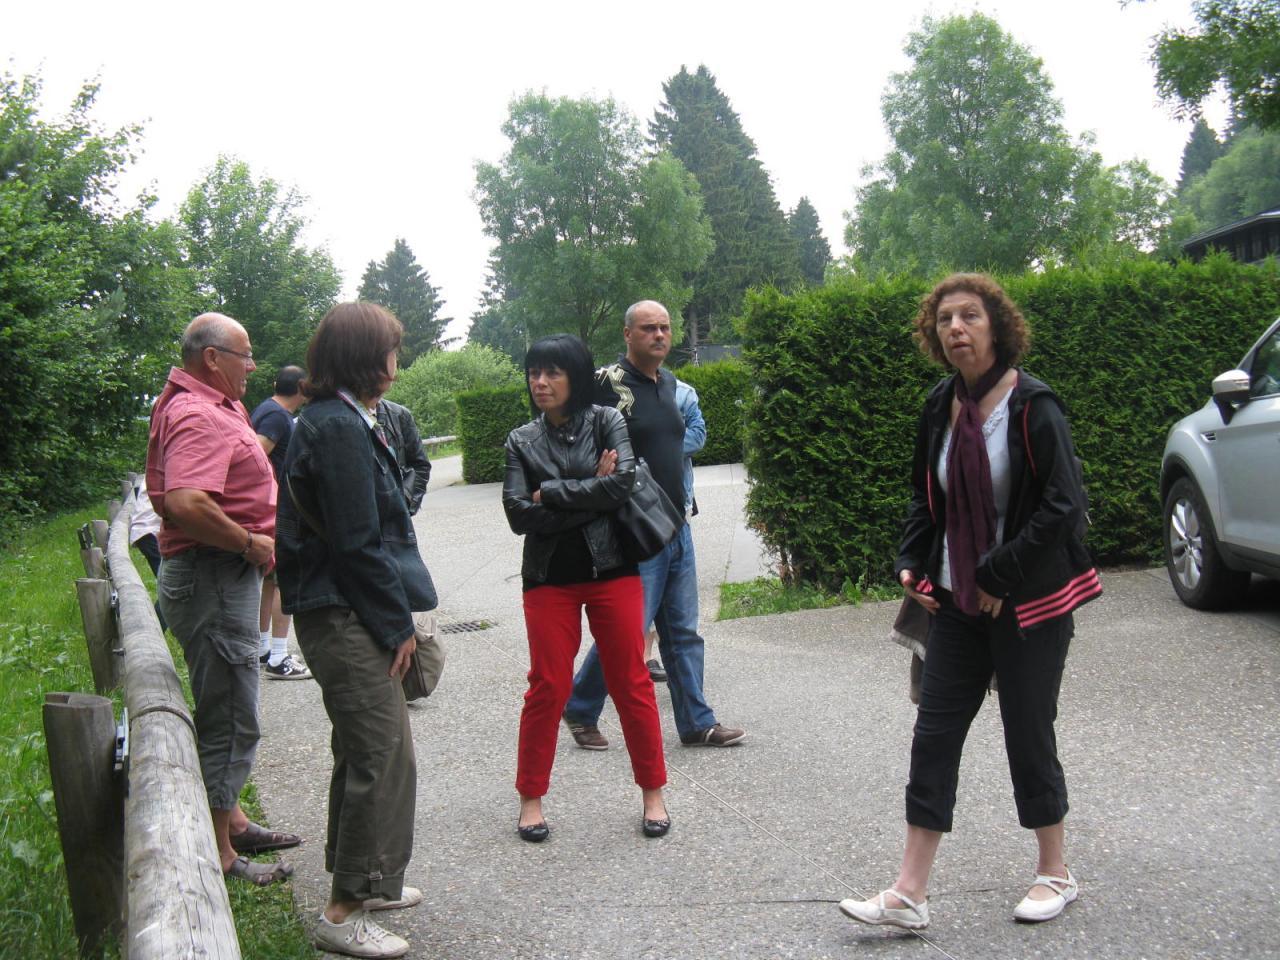 Congr+¿s +á Strasbourg du 16 au 20-06-14 222